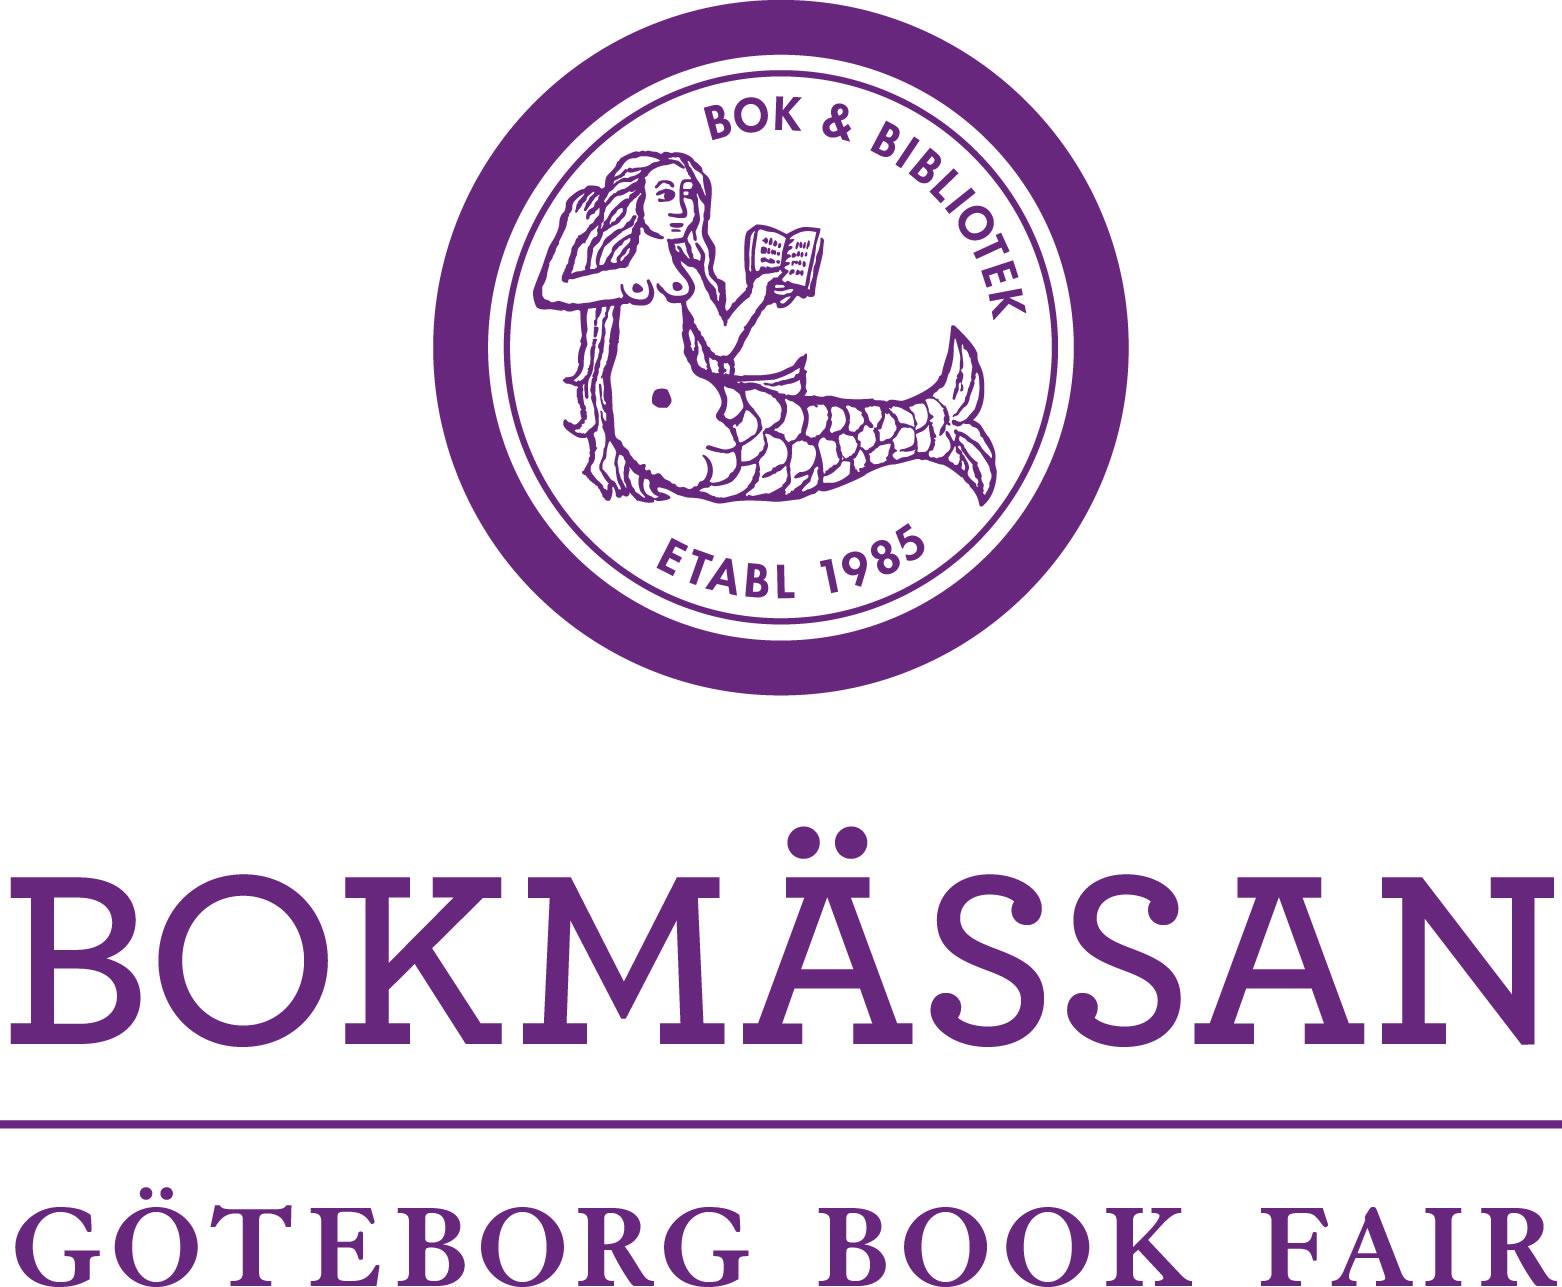 Signering på Bokmässan i Göteborg!